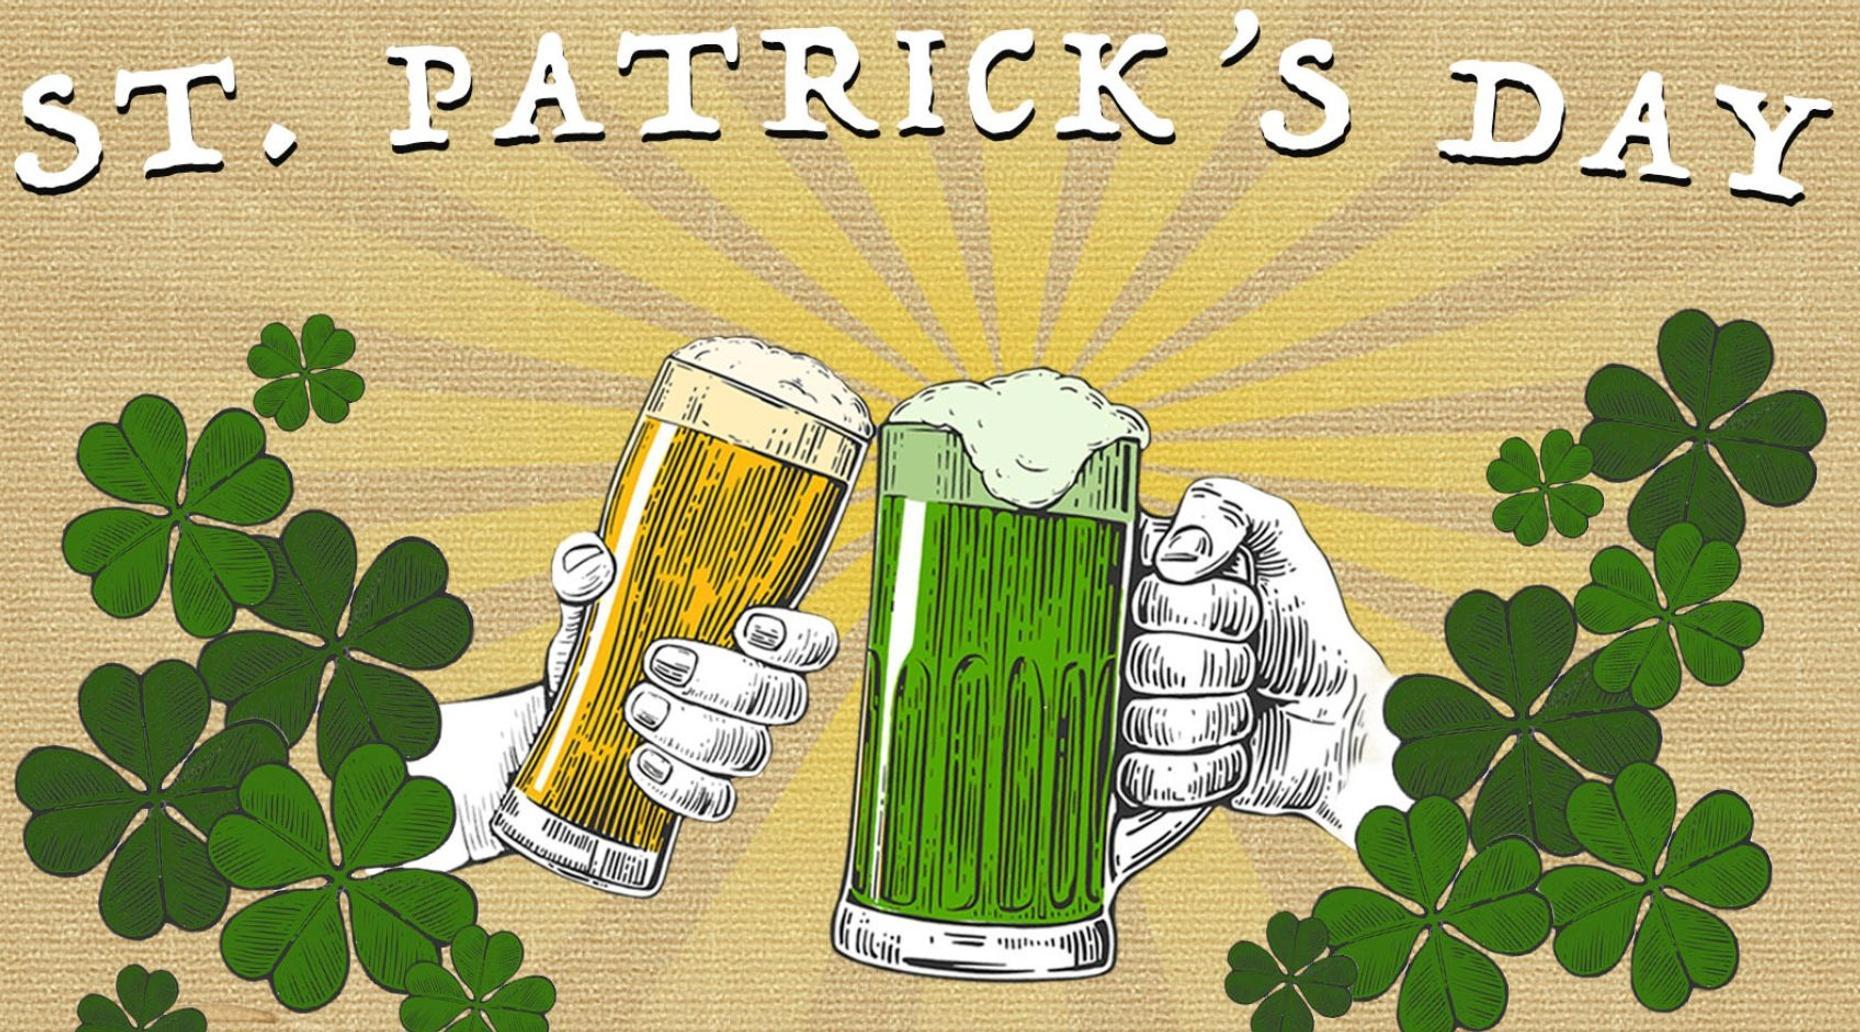 2019 Fremont Street St Patrick's Day Bar Crawl